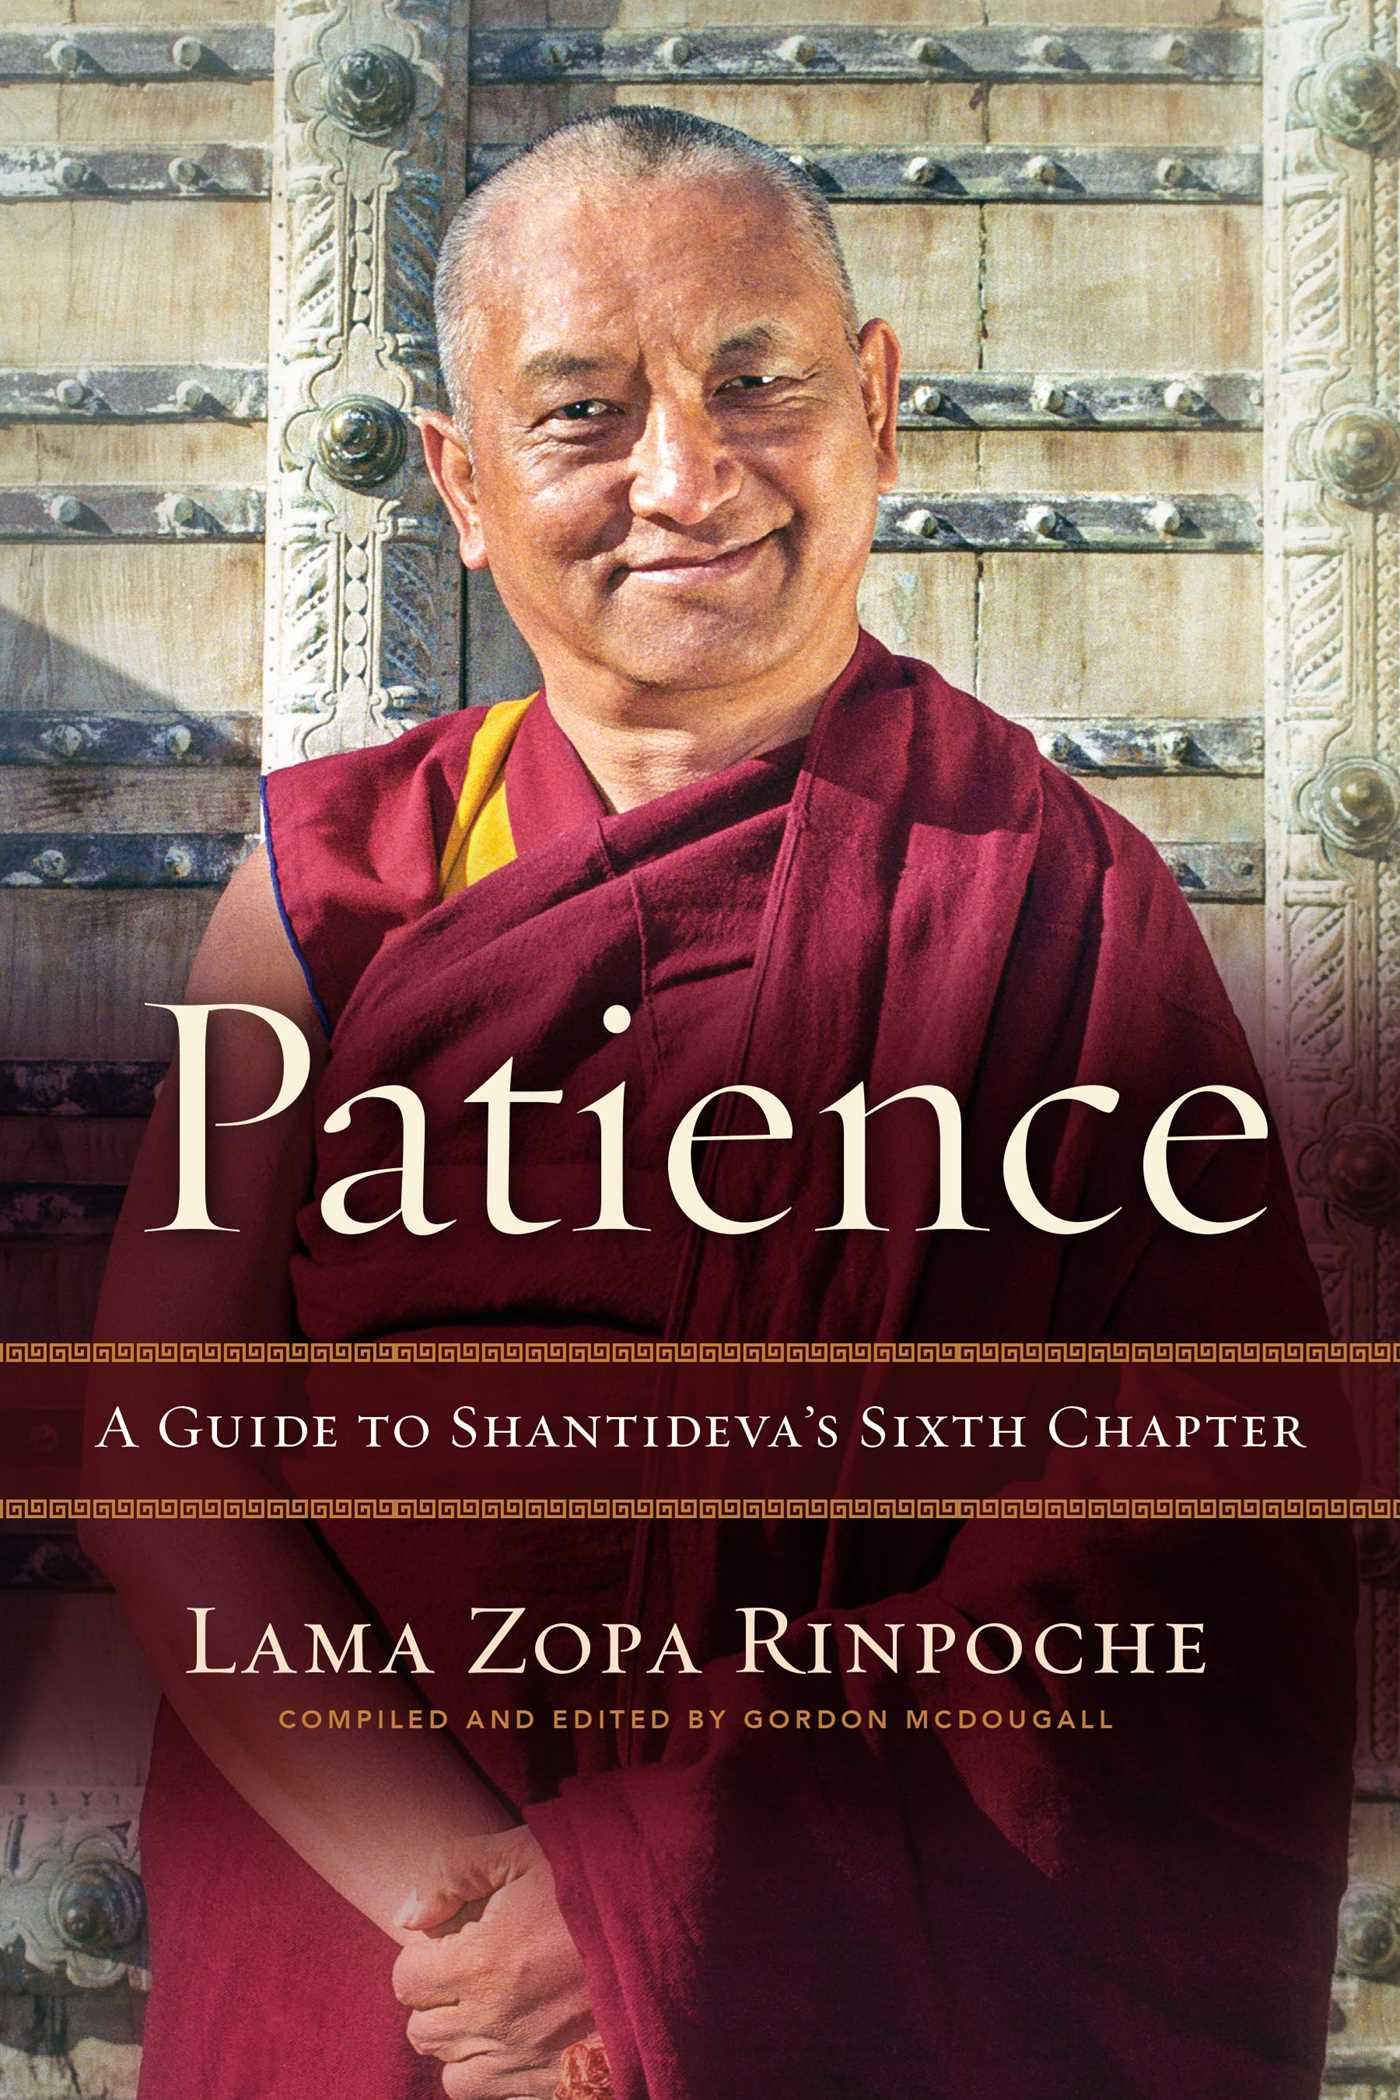 [PDF] [EPUB] Patience Download by Lama Zopa Rinpoche